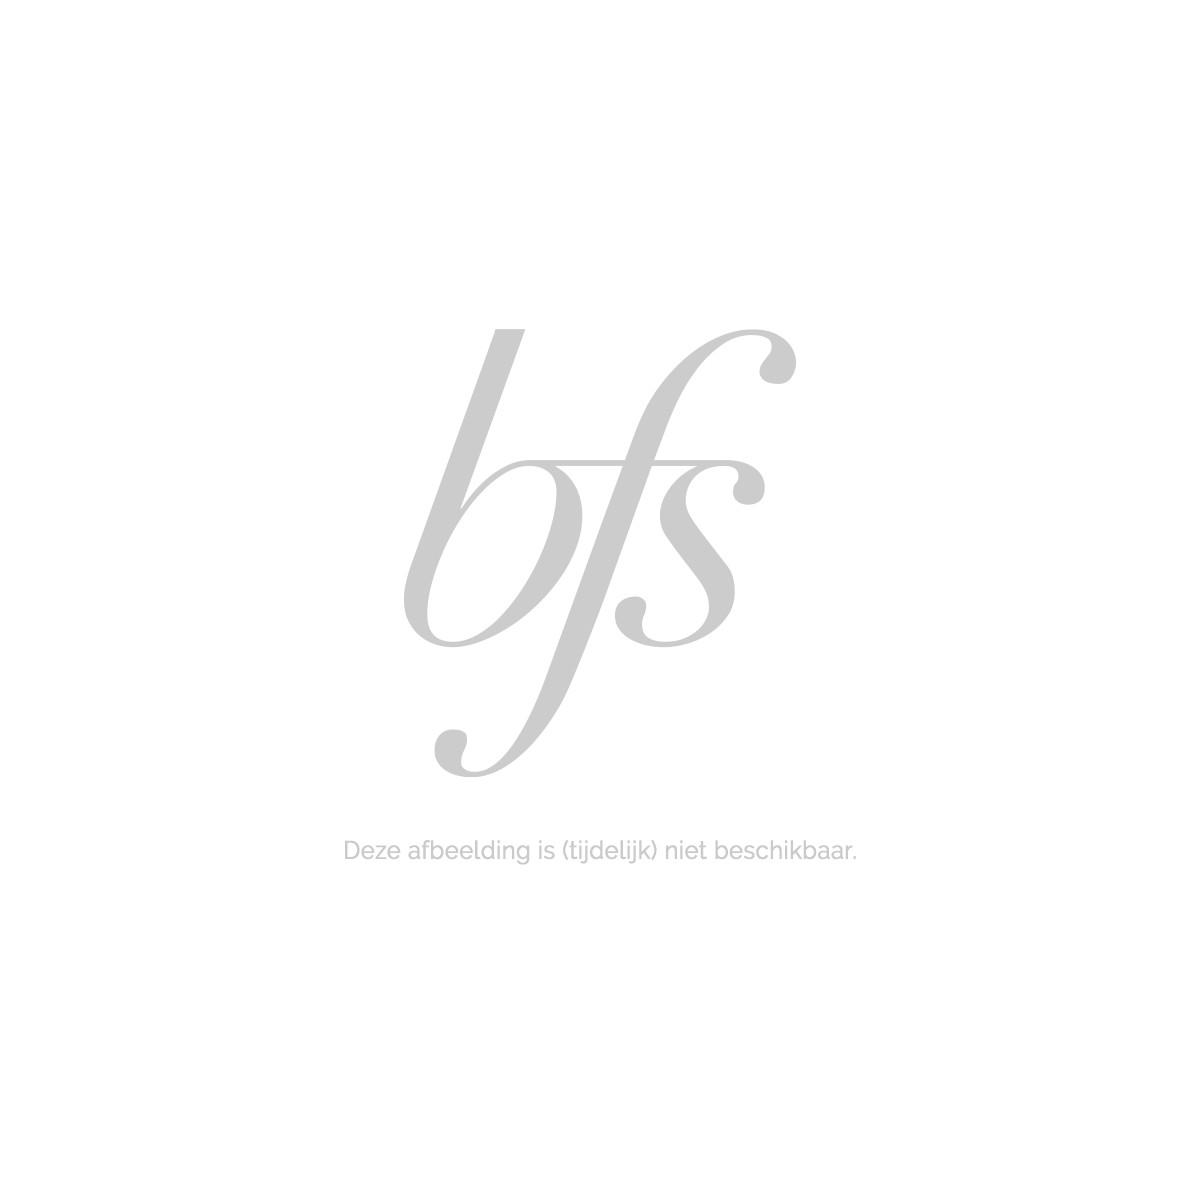 burberry my burberry blush eau de parfum 30 ml g nstig. Black Bedroom Furniture Sets. Home Design Ideas